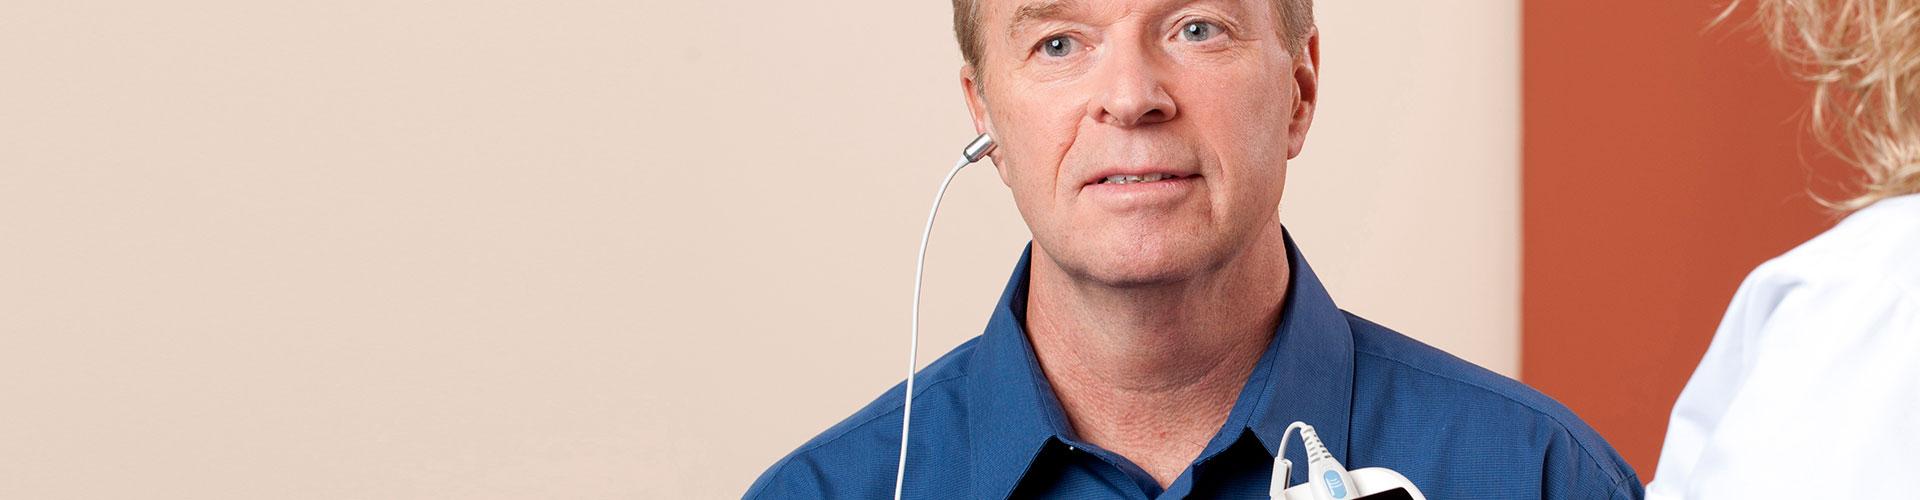 Corti OAE Testing Audiologist Patient